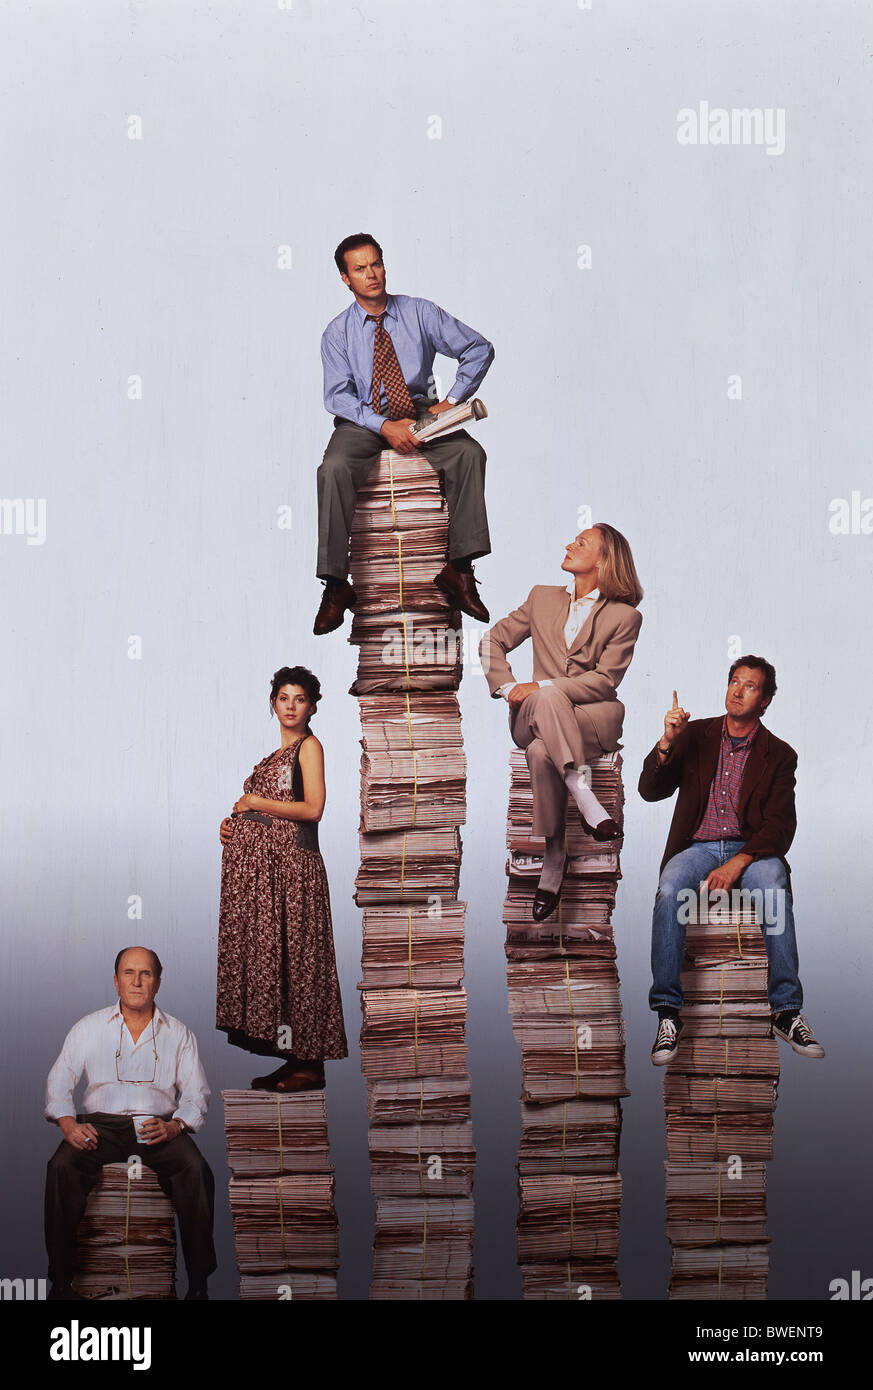 THE PAPER (1994) MICHAEL KEATON, ROBERT DUVALL, MARISA TOMEI, GLENN CLOSE, RANDY QUAID RON HOWARD (DIR) - Stock Image